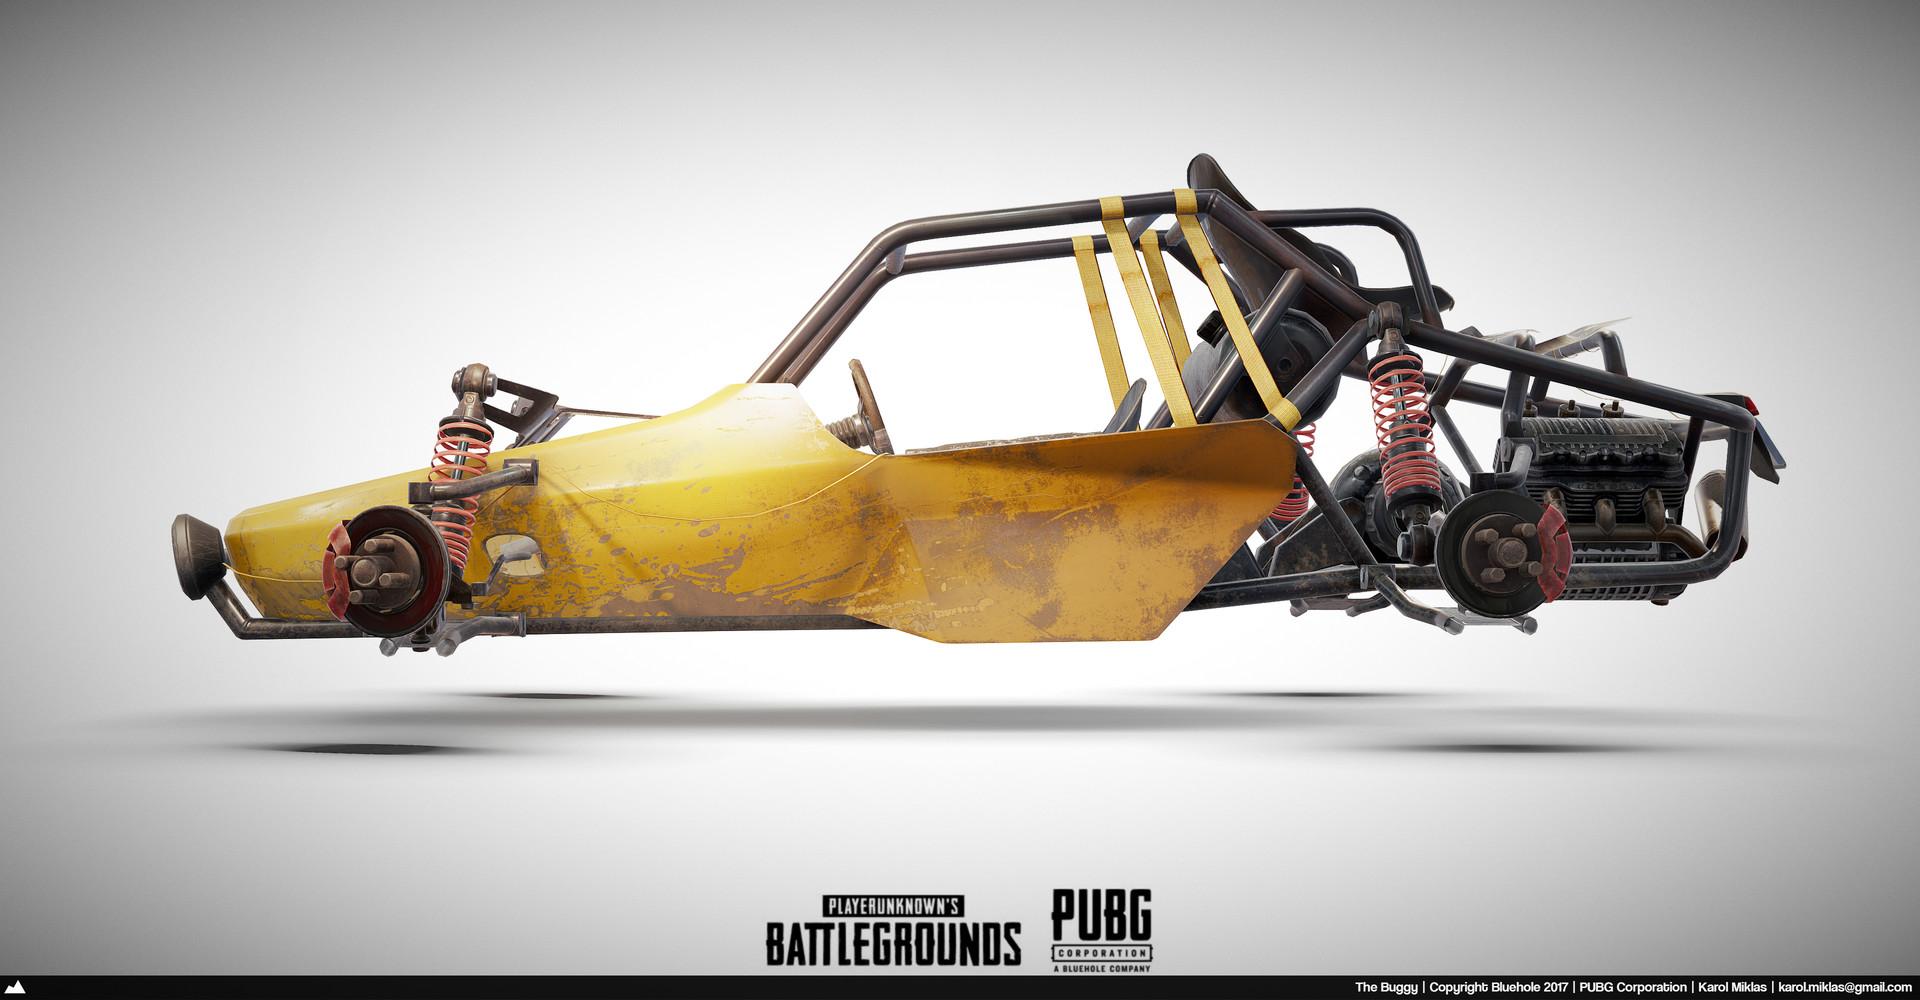 Pubg Buggy Wallpaper: Playerunknown's Battlegrounds: Buggy